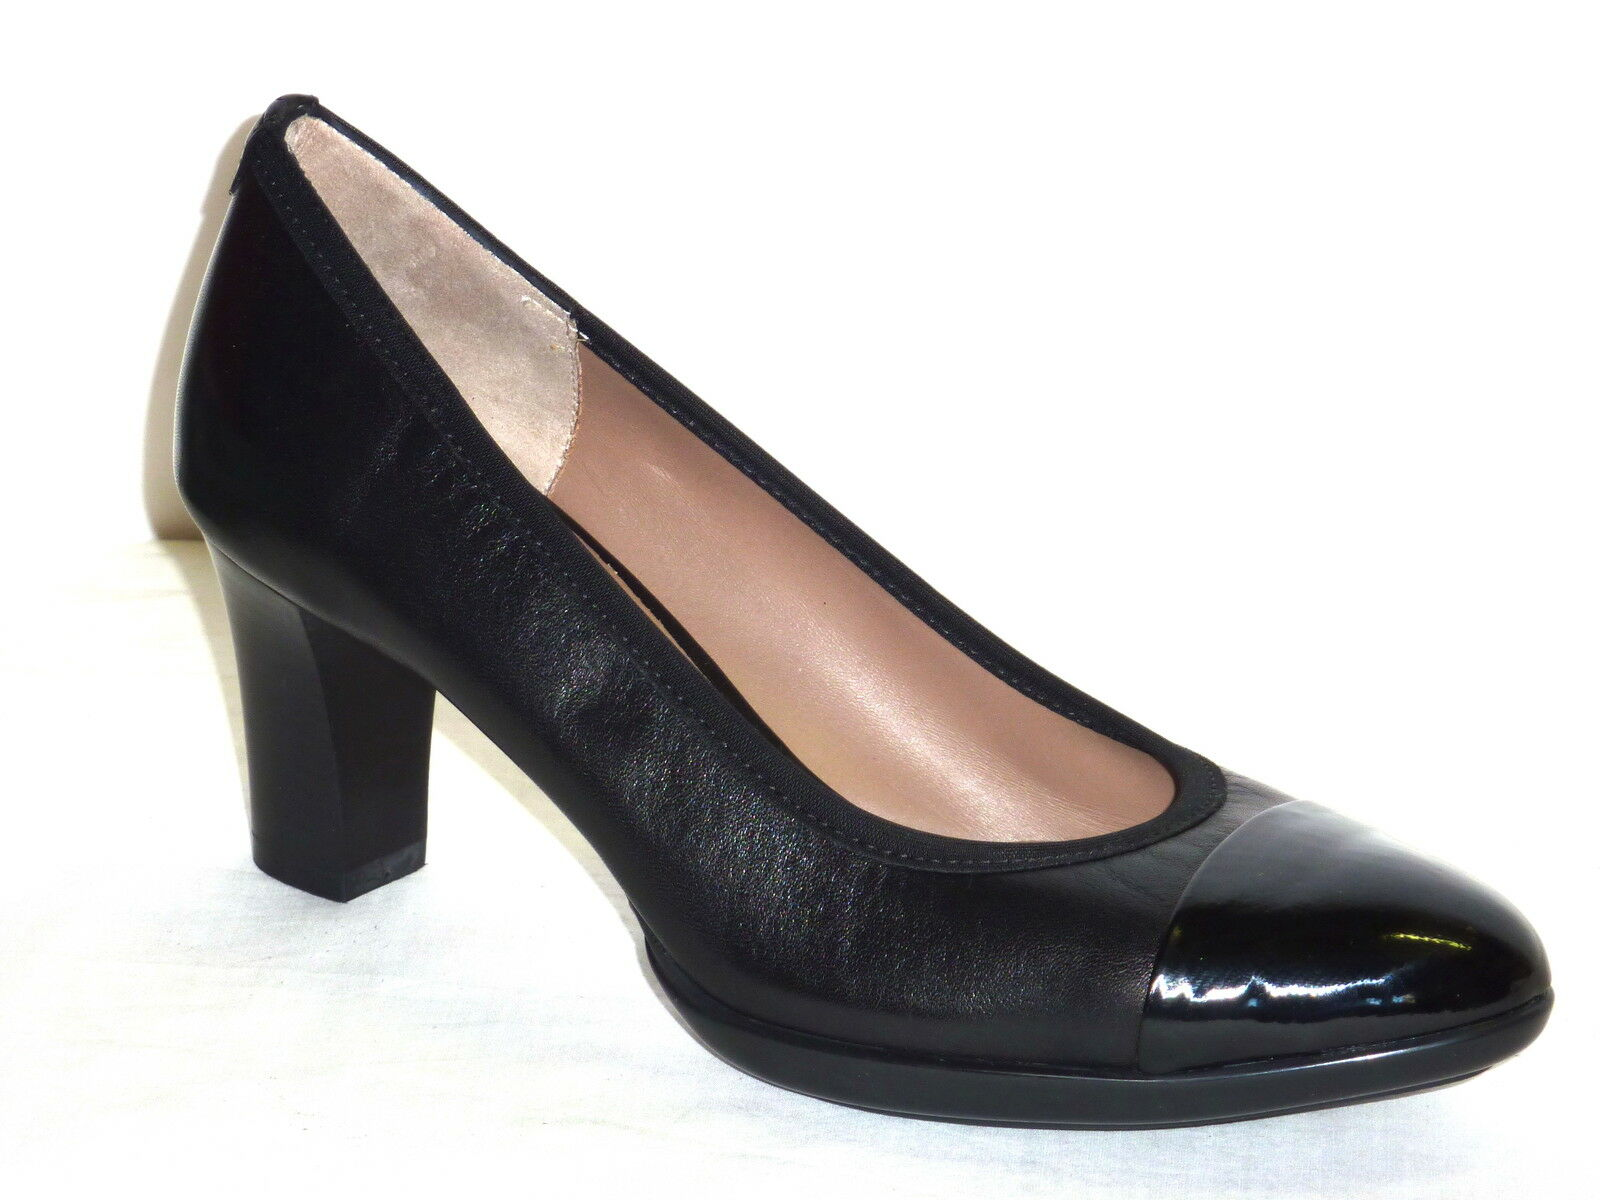 D5112 MELLUSO MELLUSO MELLUSO chaussures femmes PELLE noir DECOLLETE' TACCO MEDIO MODA COMODA n. 35 4bc1e5